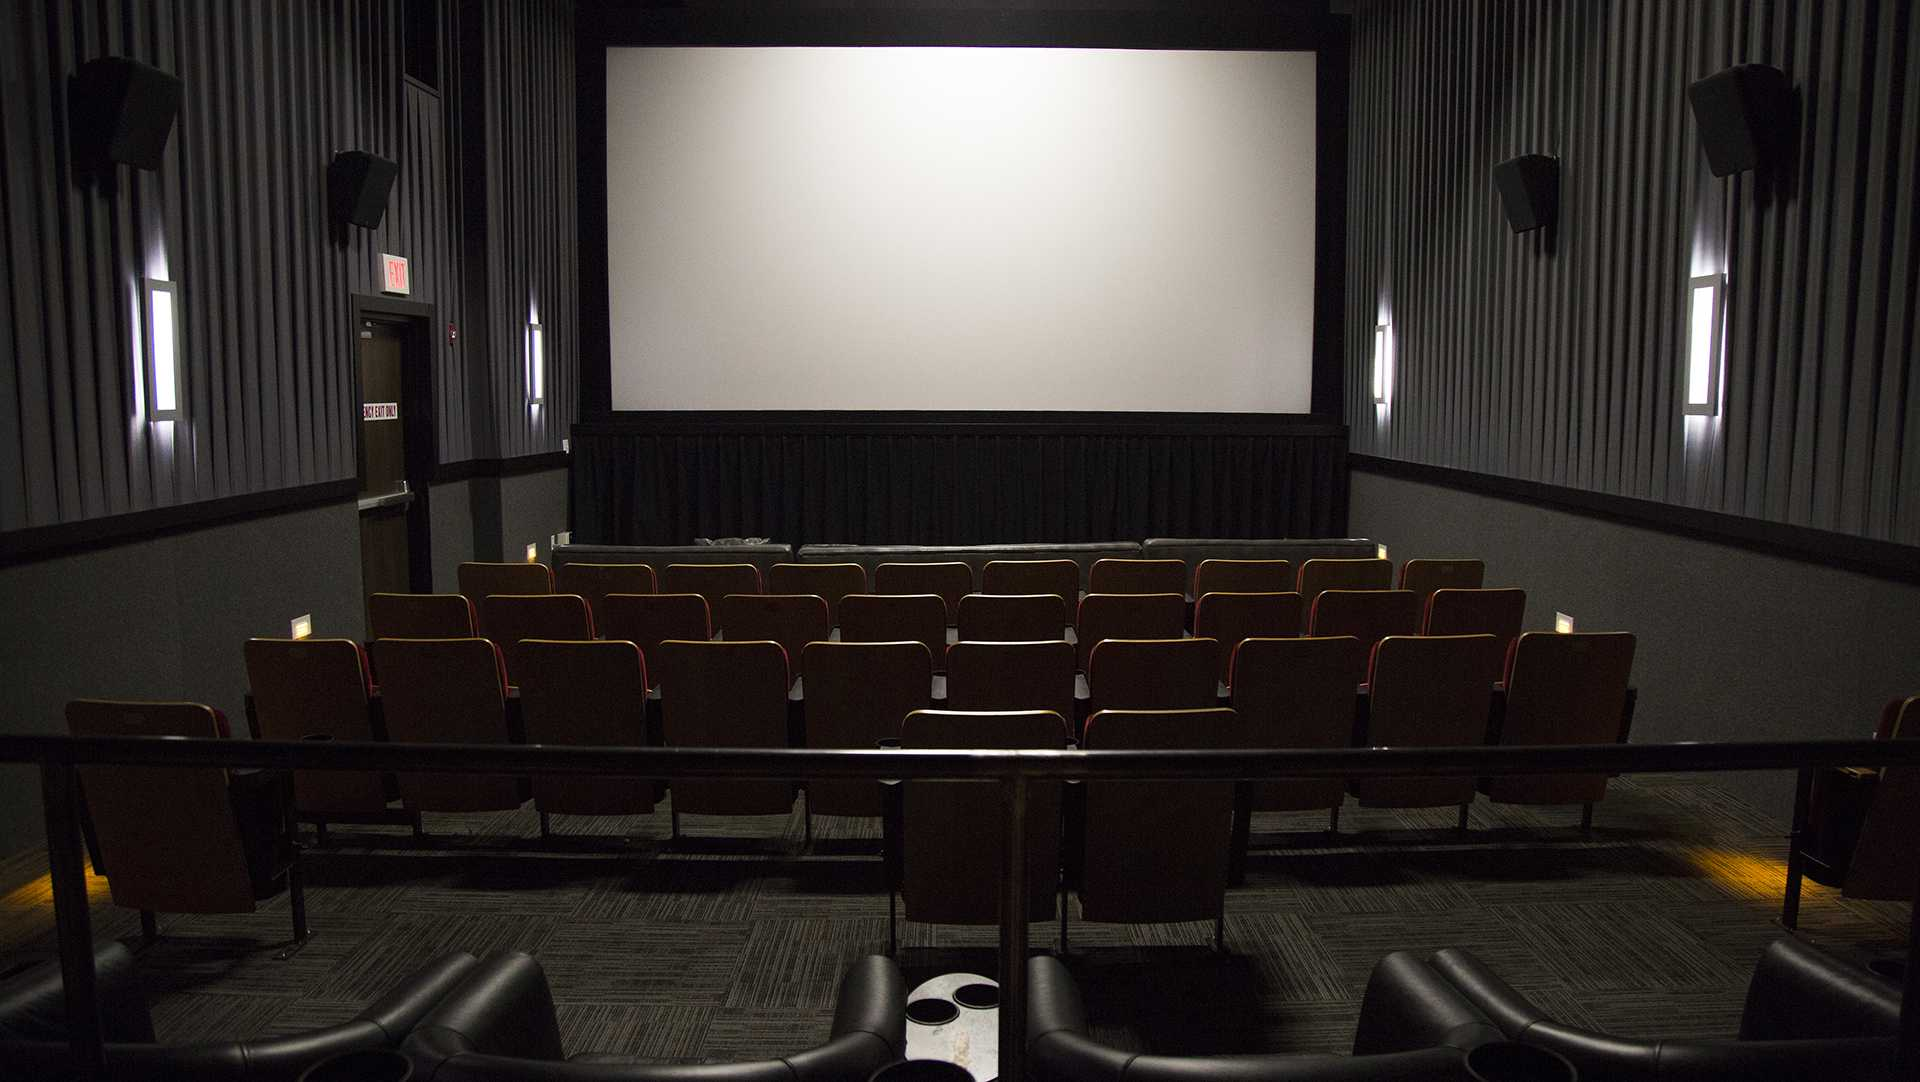 The FilmScene theater screen is shown Dec. 10, 2015. (The Daily Iowan/file)